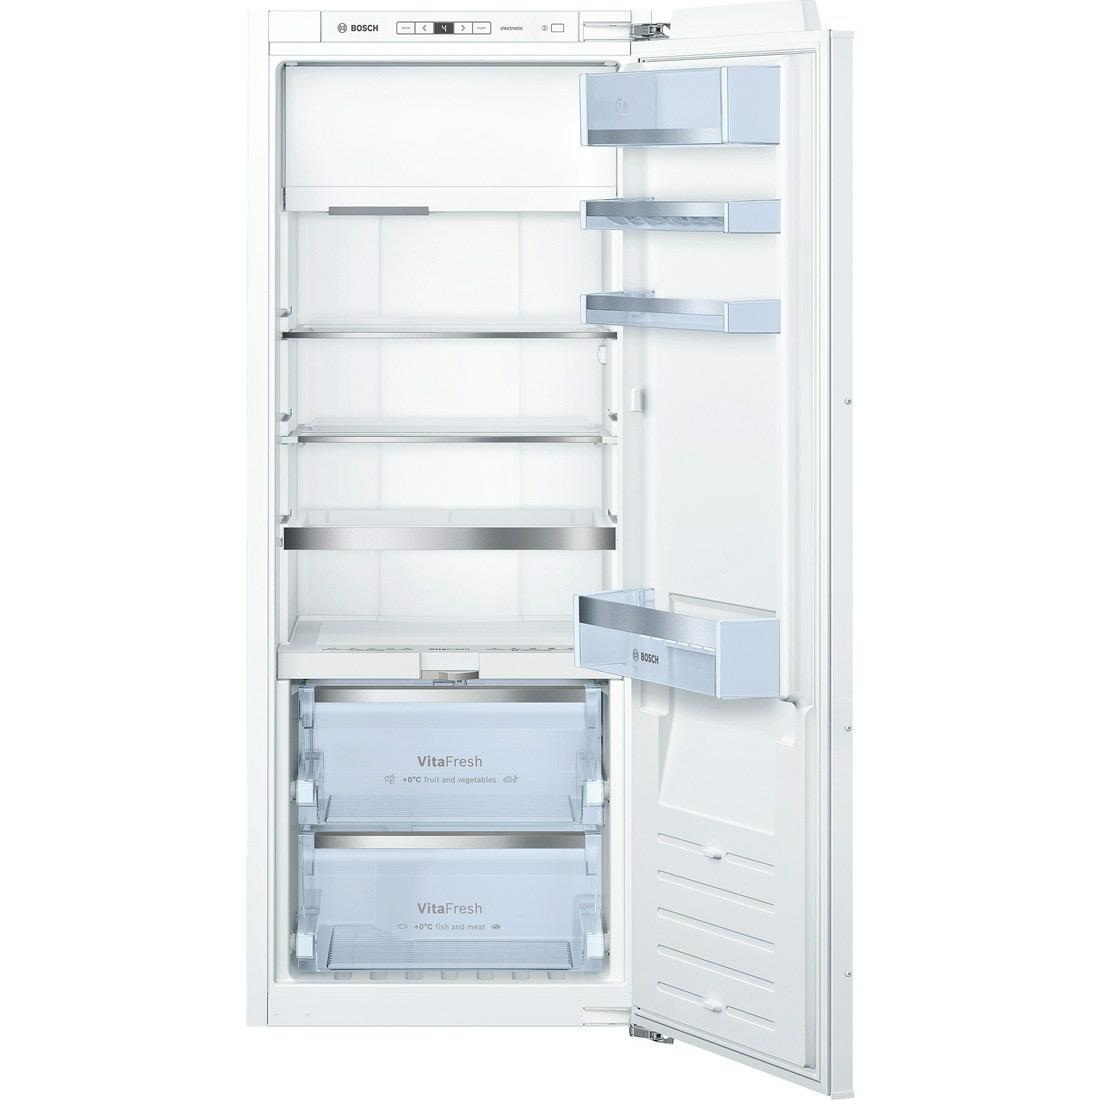 koelkast inbouw met vriesvak Bosch KIF52AF30 koelkast inbouw met vriesvak KIF 52AF30 KIF 52 AF 30